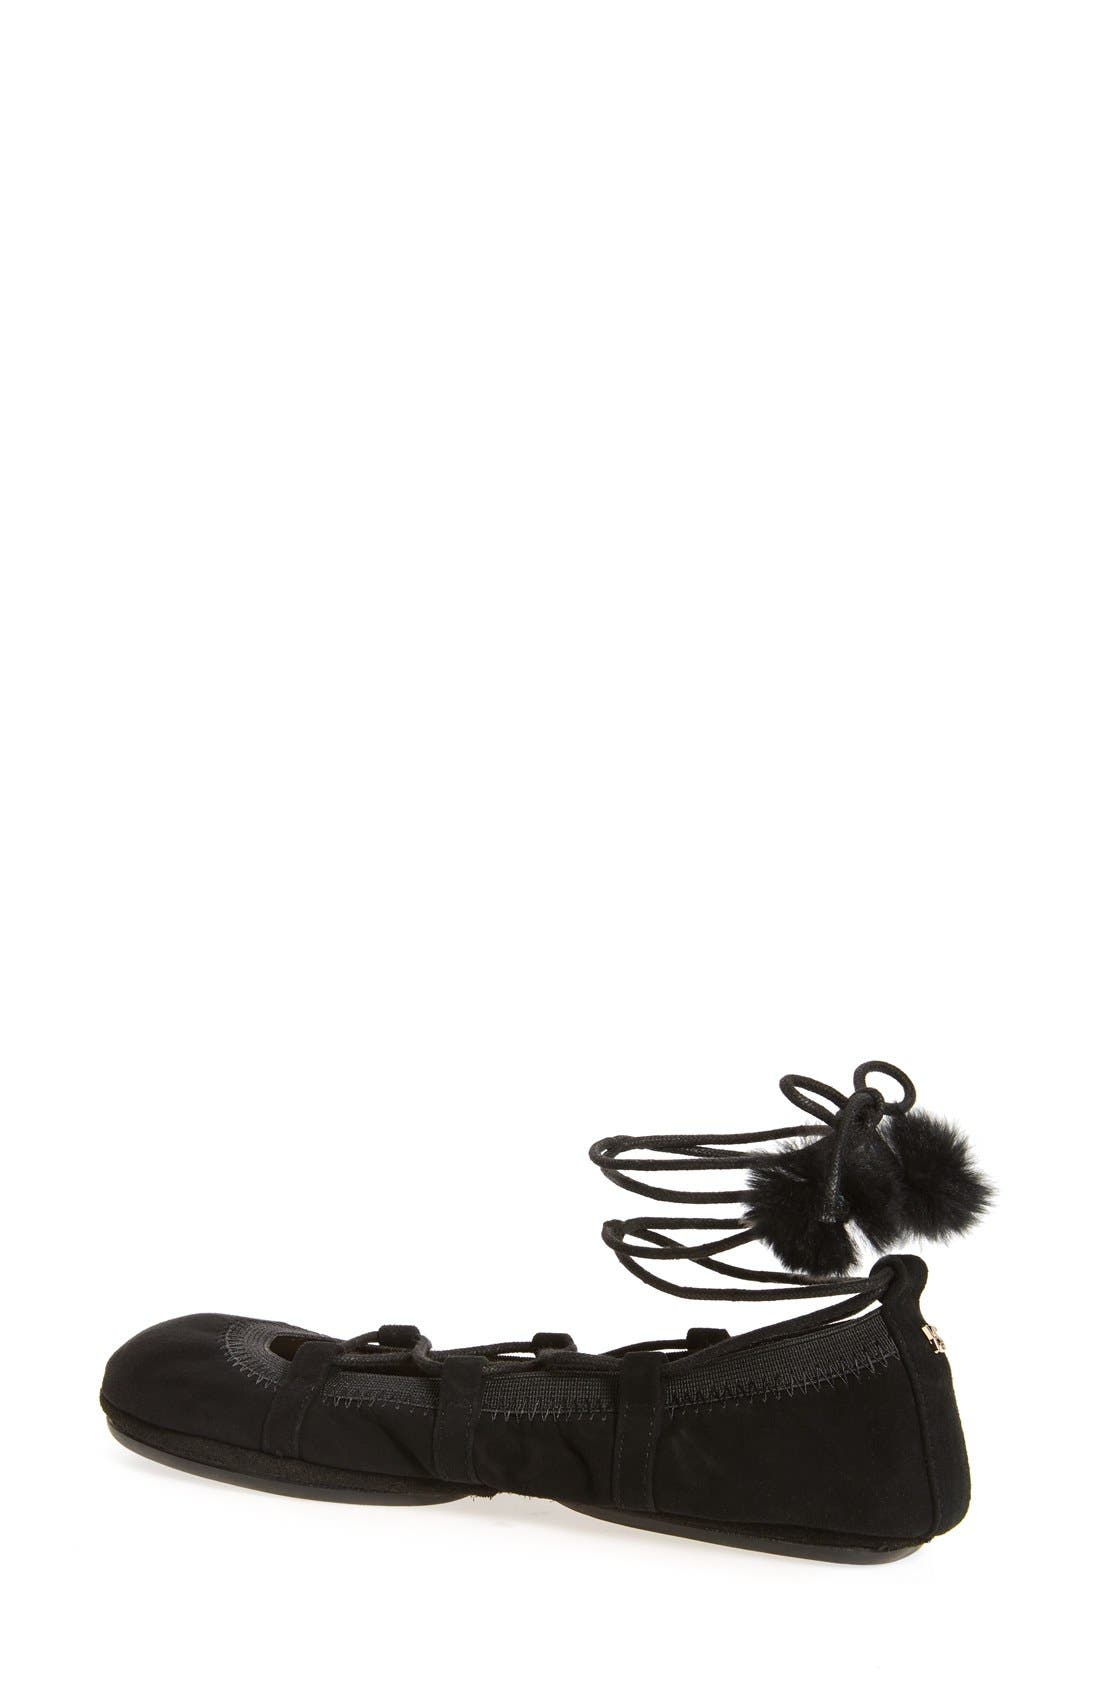 Alternate Image 2  - Yosi Samra Seleste Foldable Ballet Flat (Women)